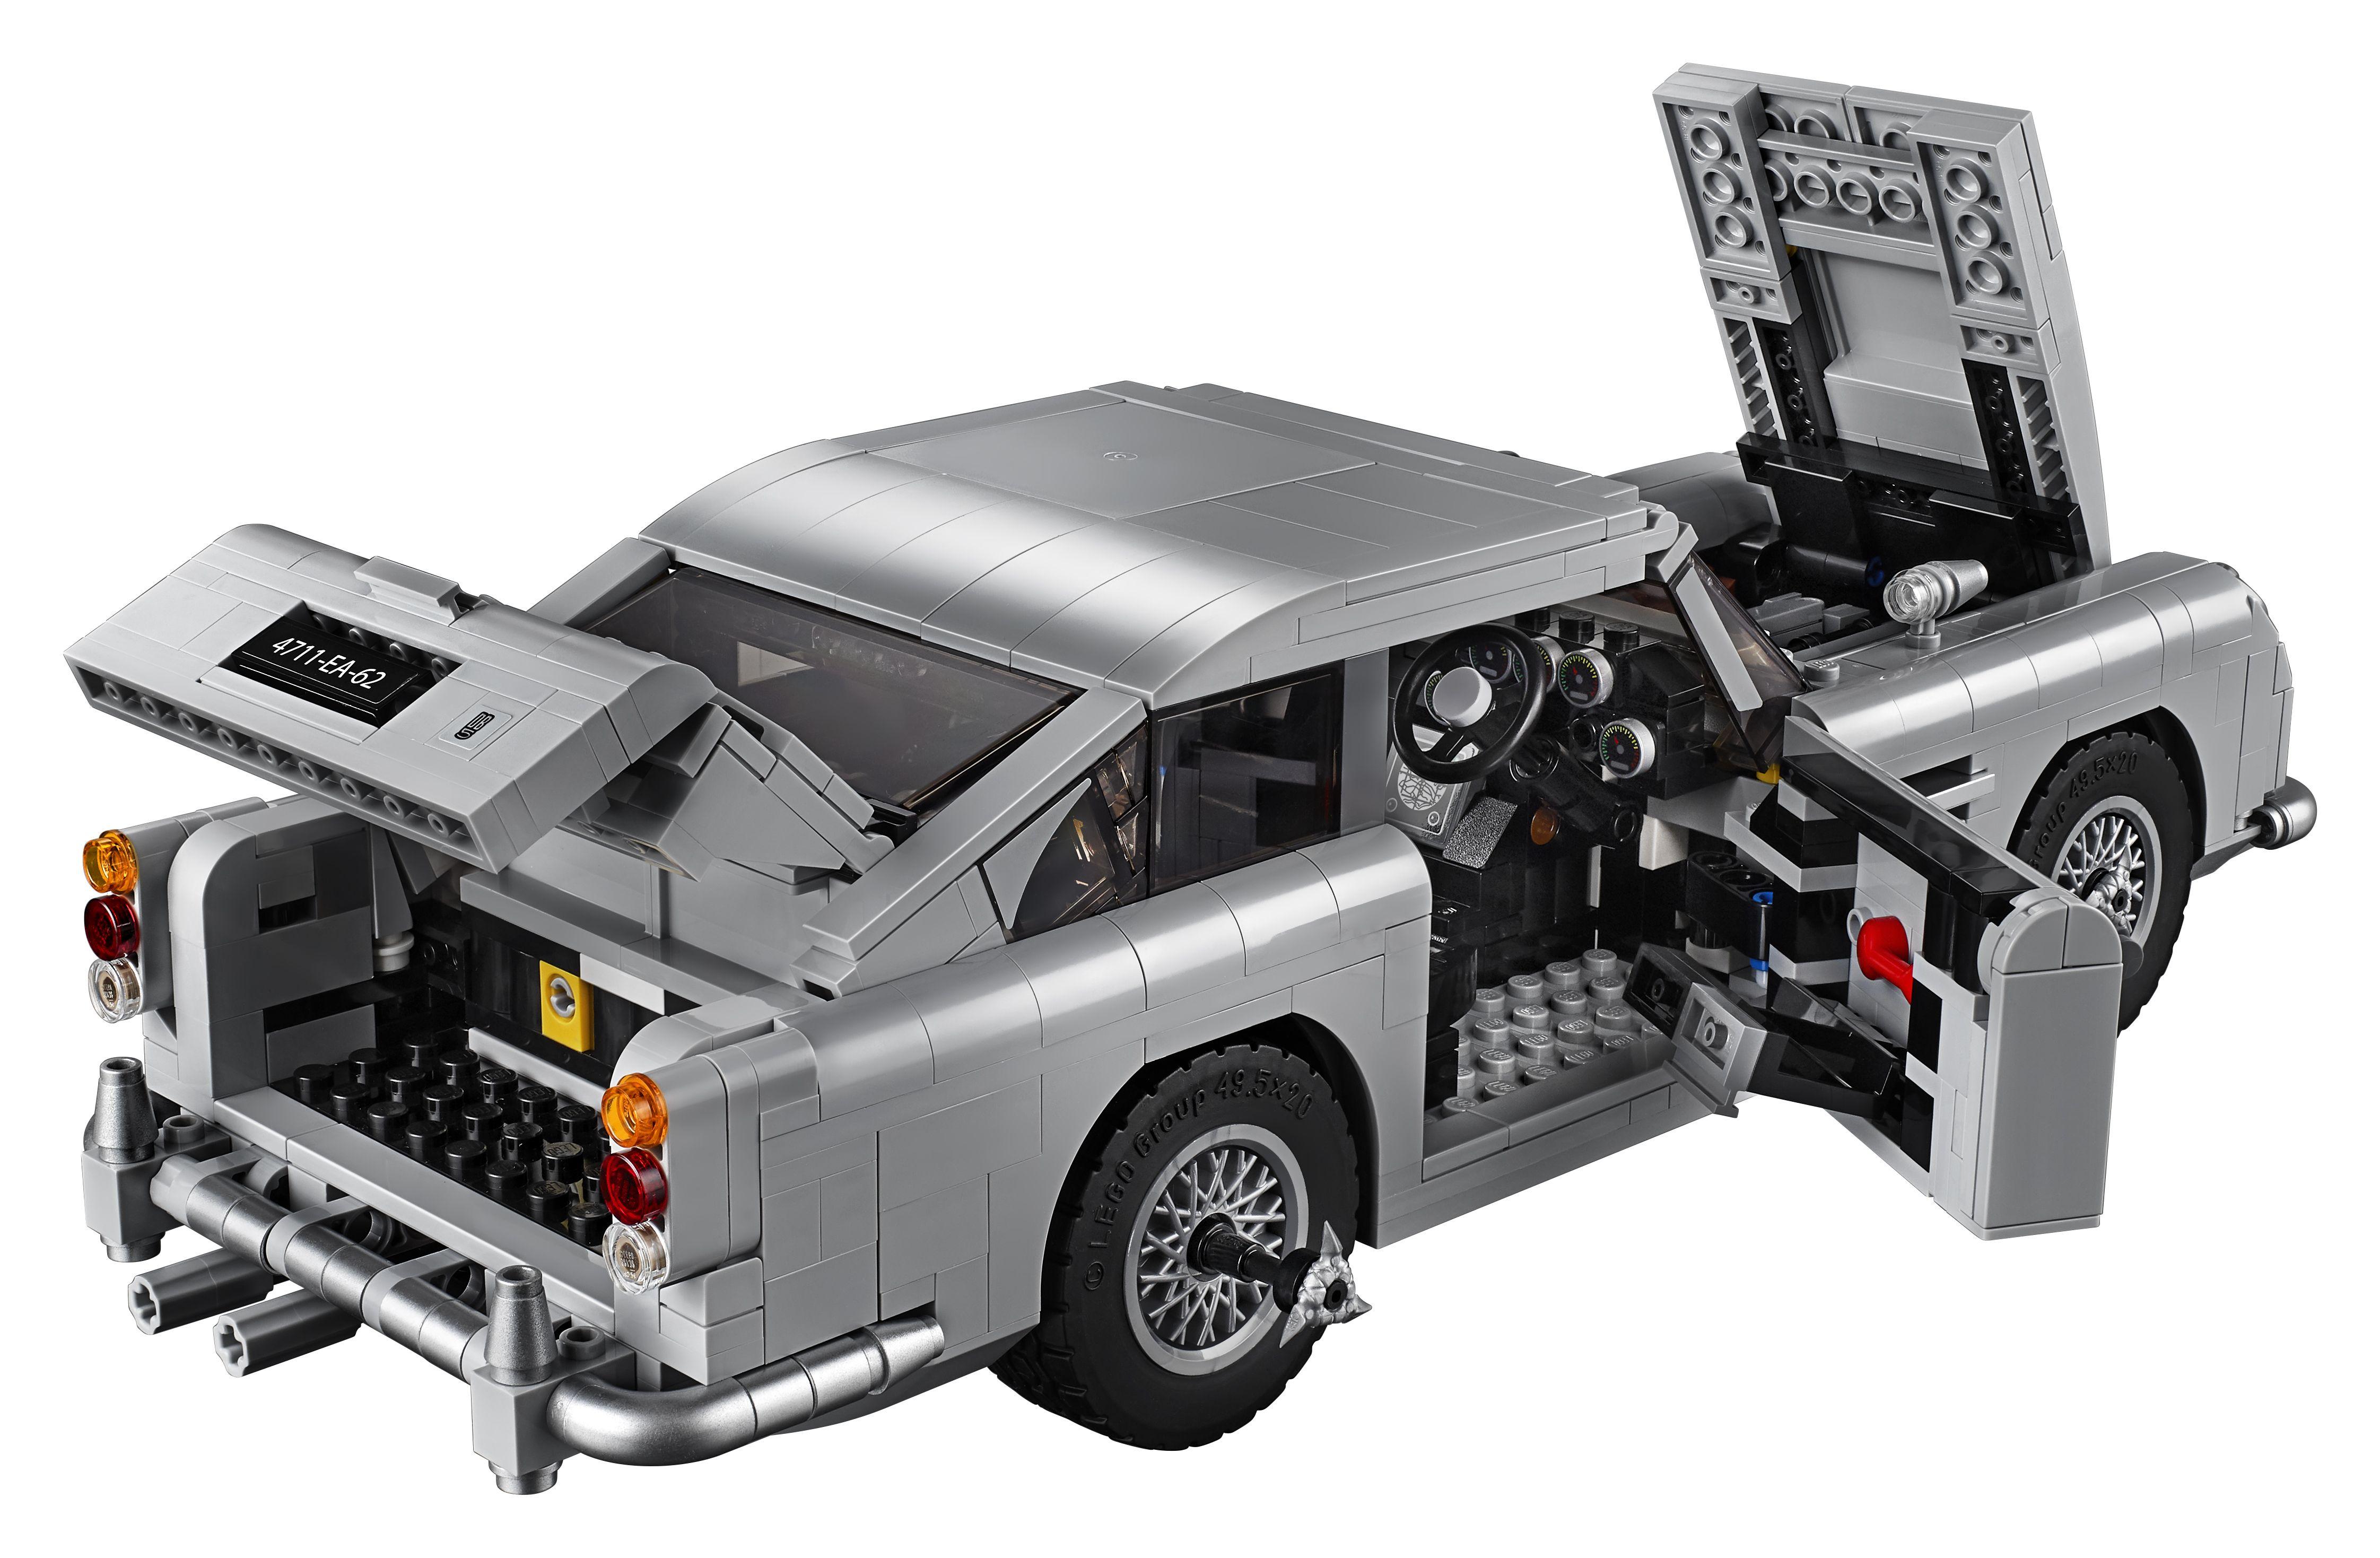 Lego Reveals A James Bond 1964 Aston Martin Db5 Car Set New James